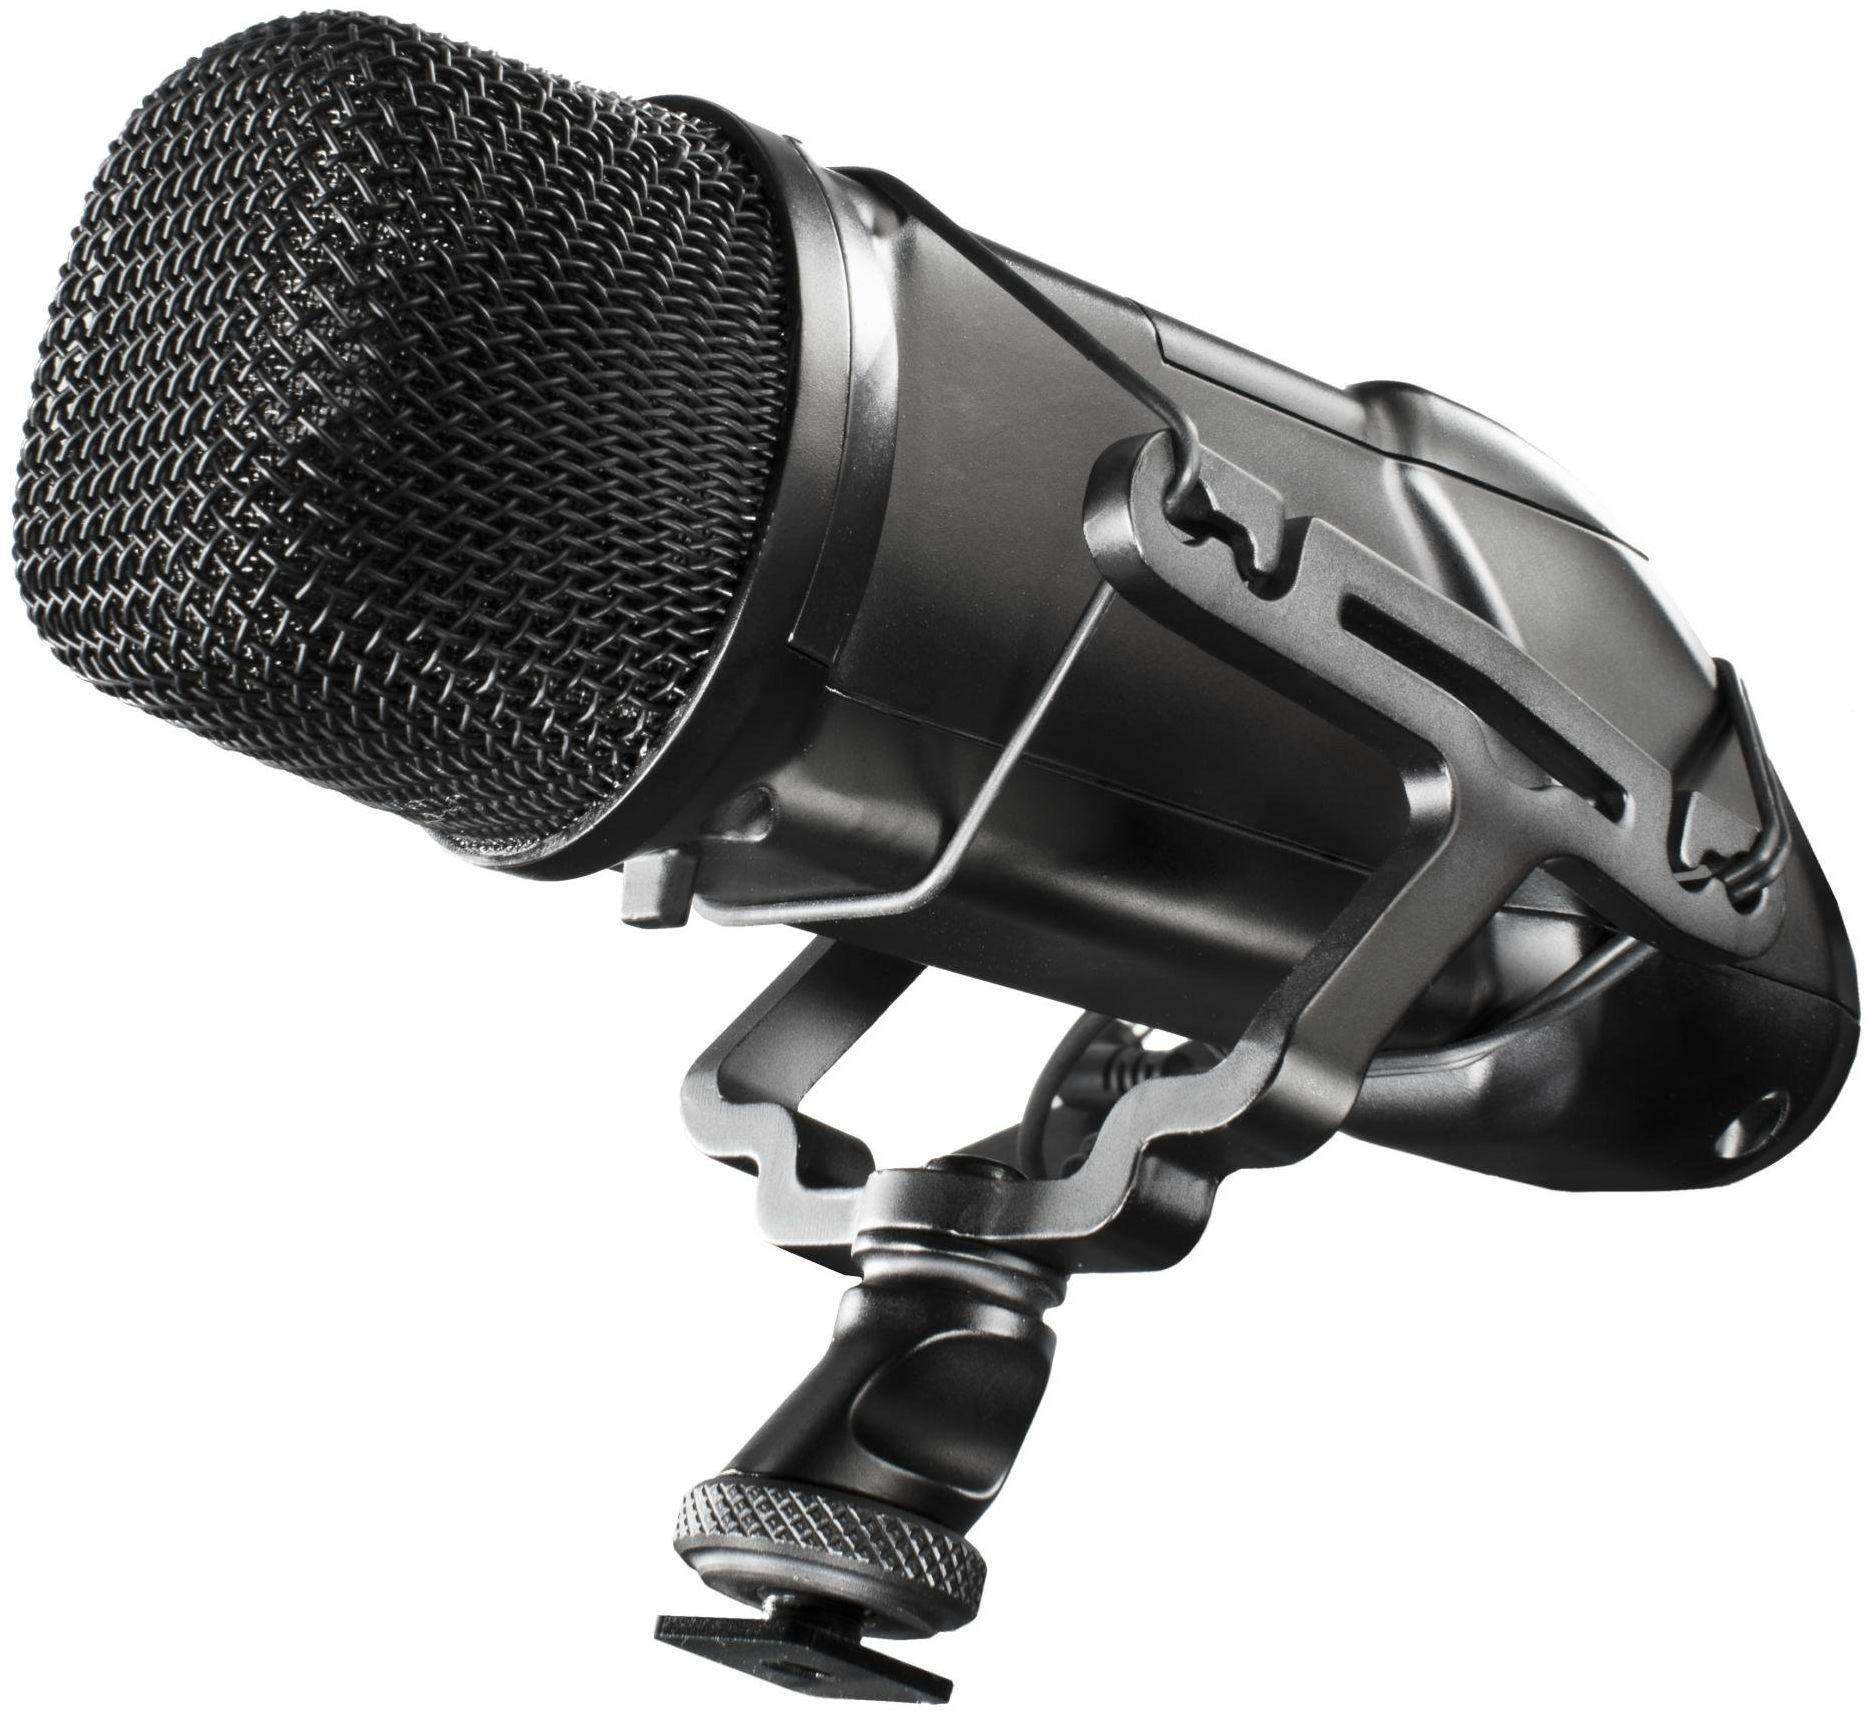 Walimex Pro mikrofon stereo do aparatu DSLR